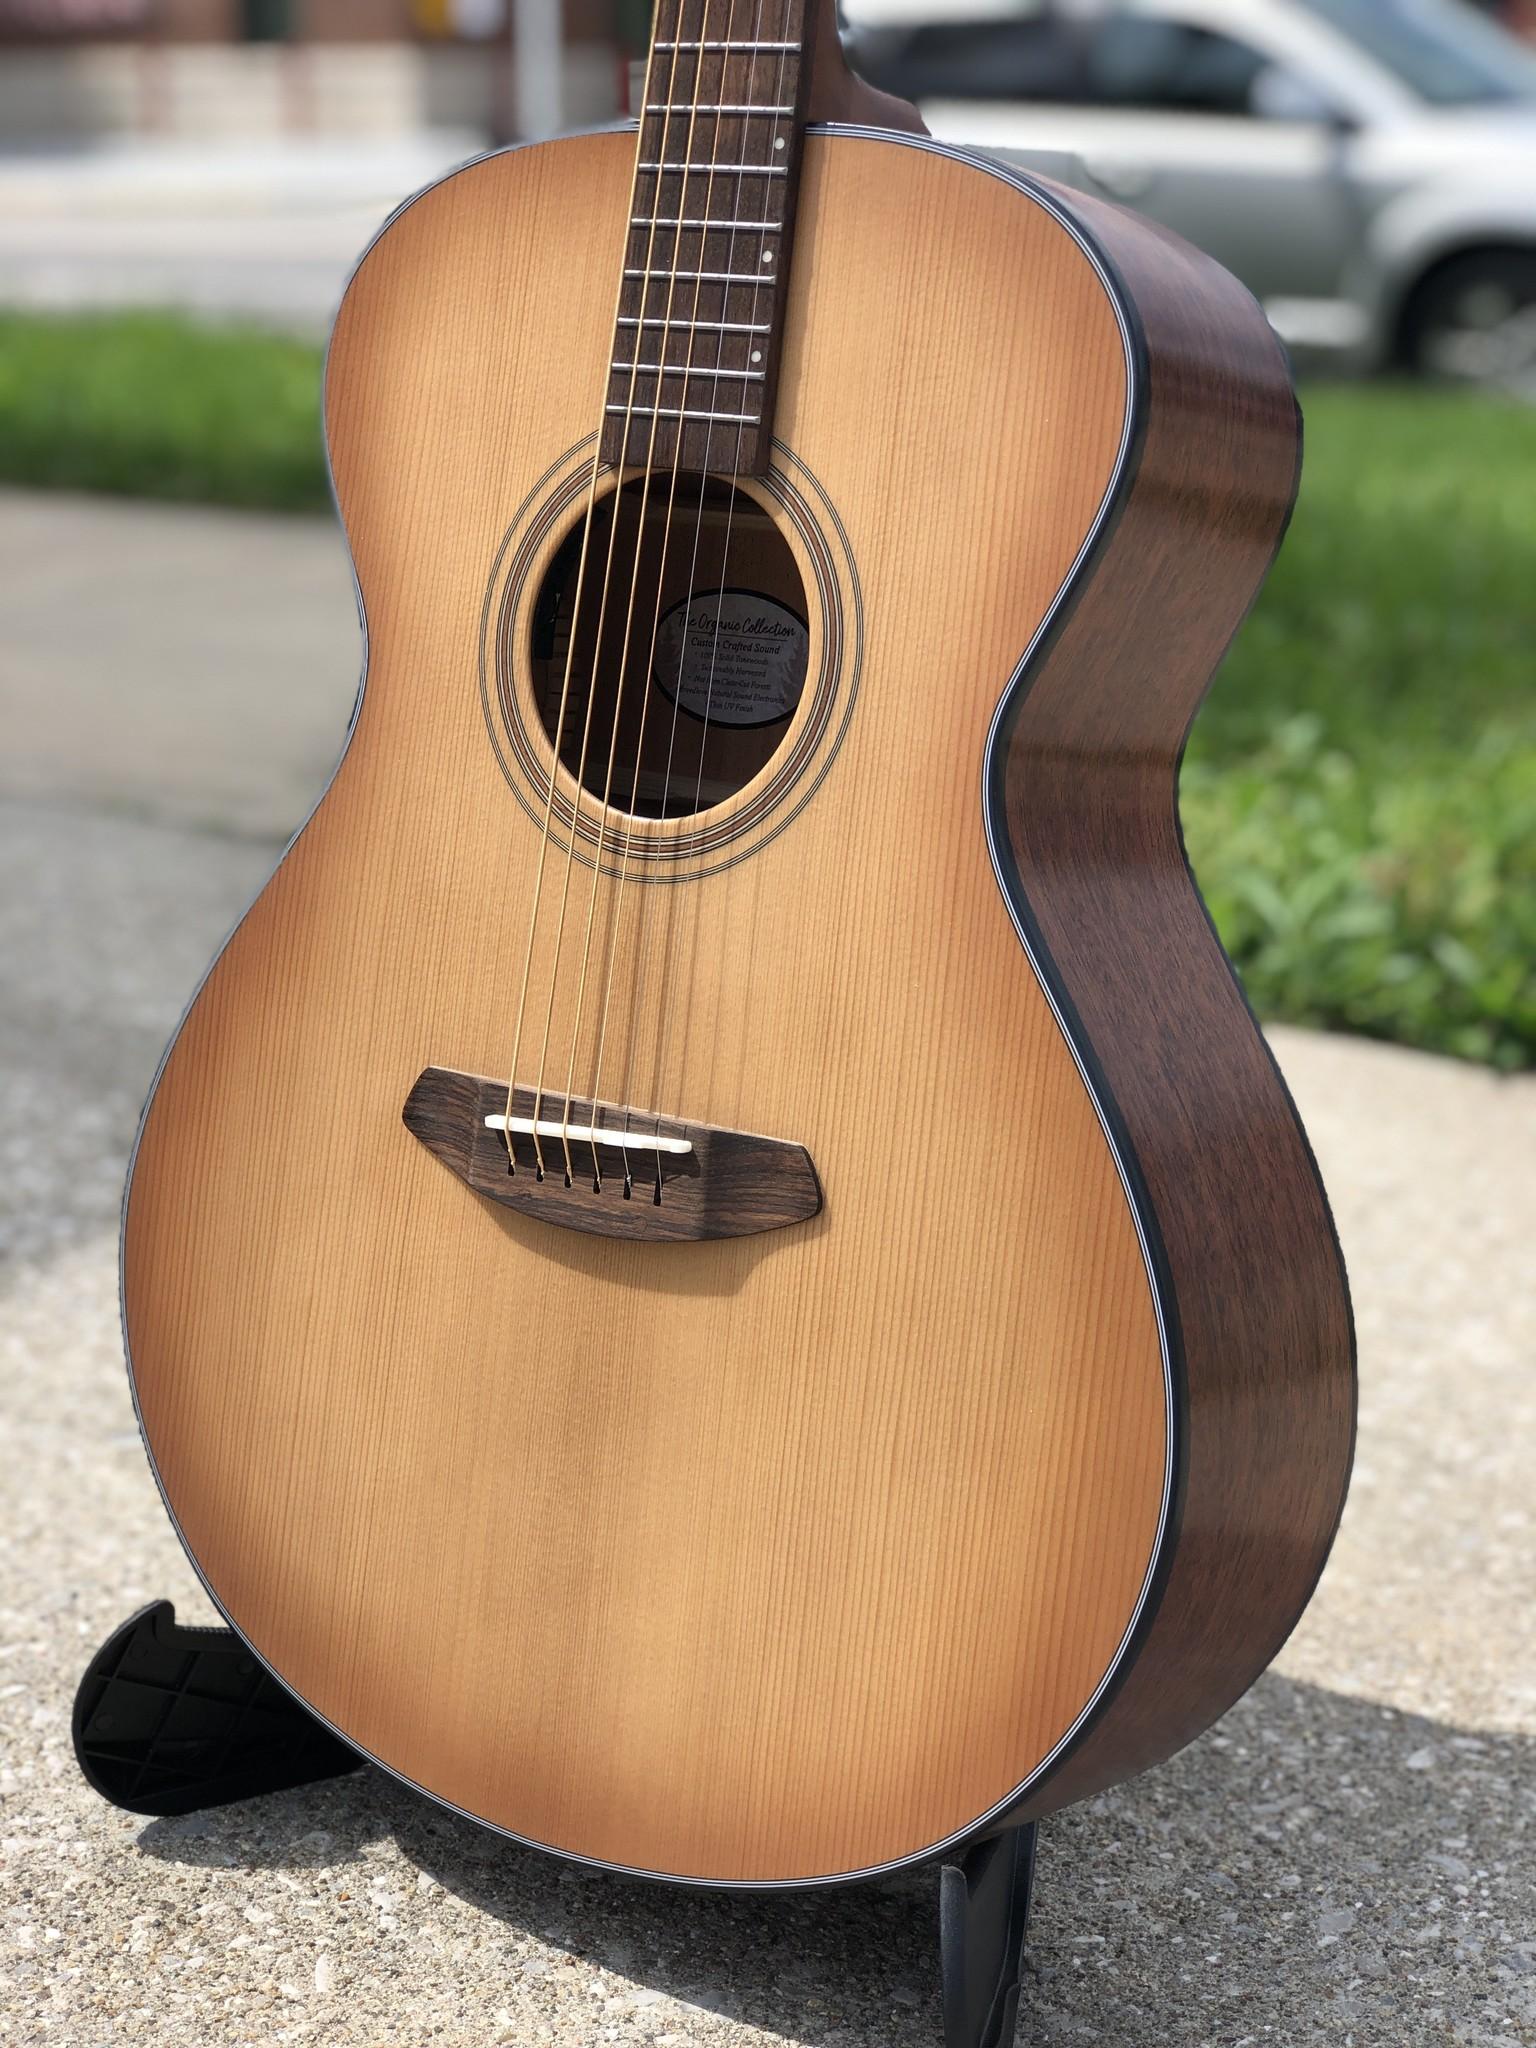 Breedlove Guitars Signature Concert Copper E Acoustic Electric-4